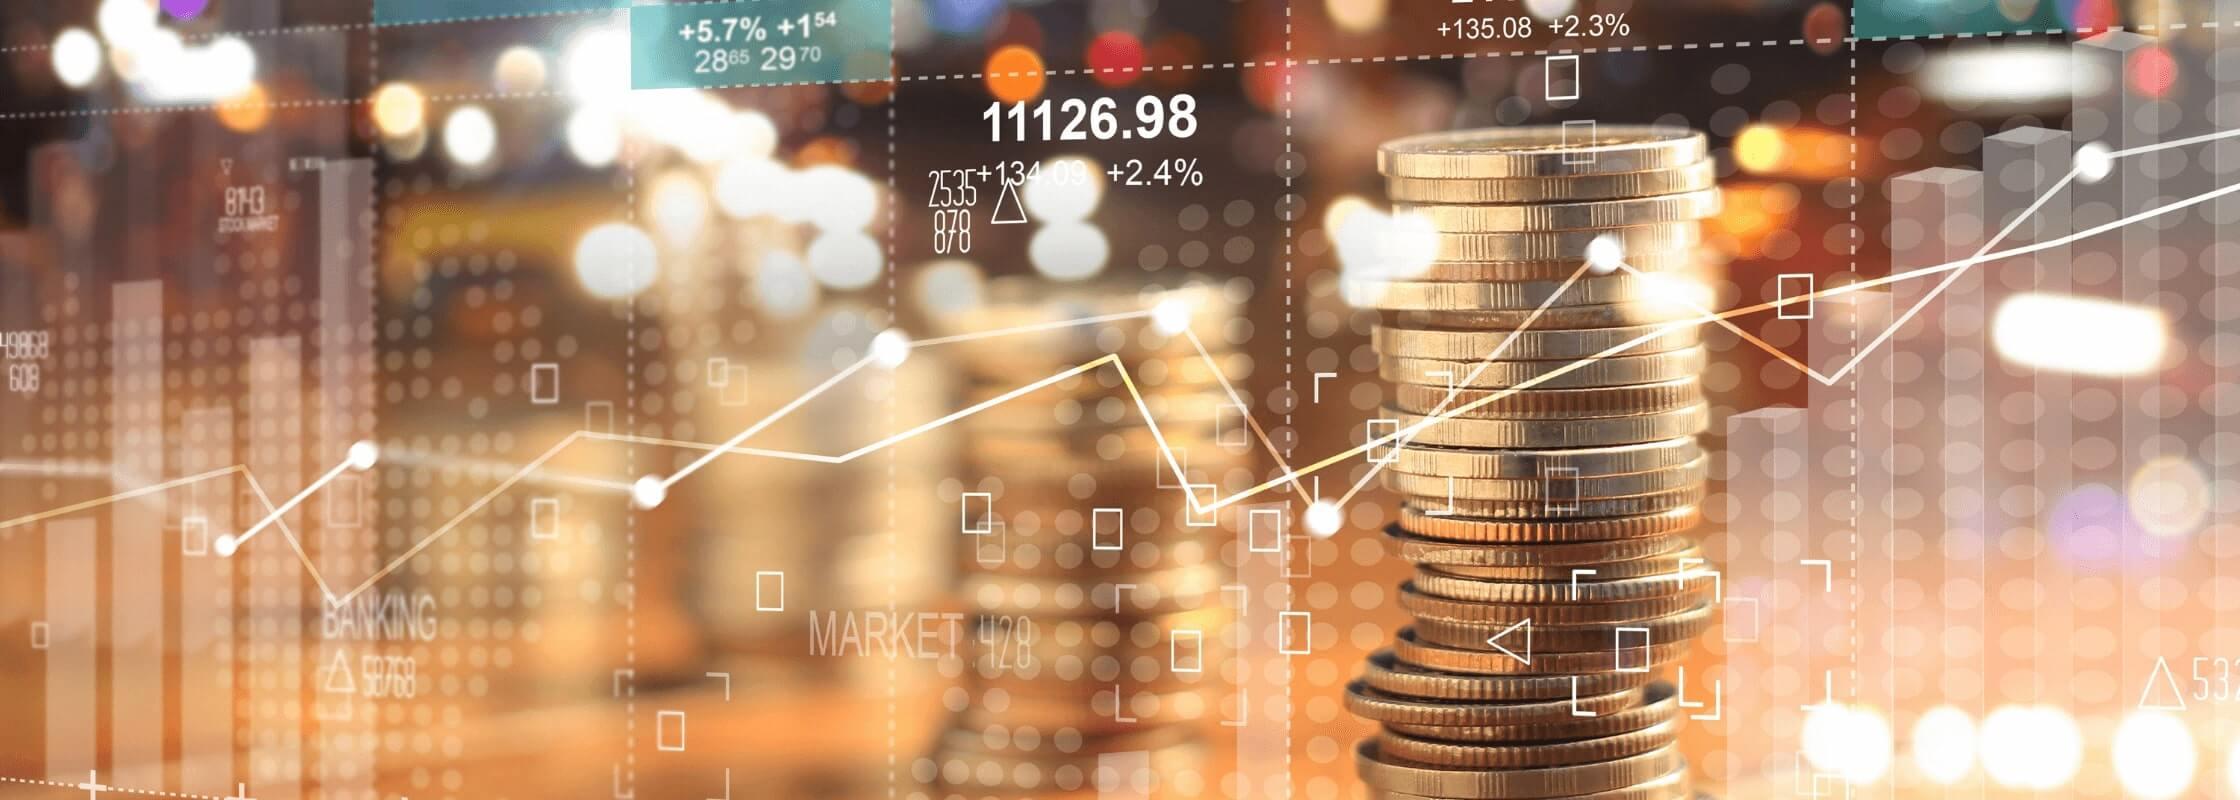 financial services license malta